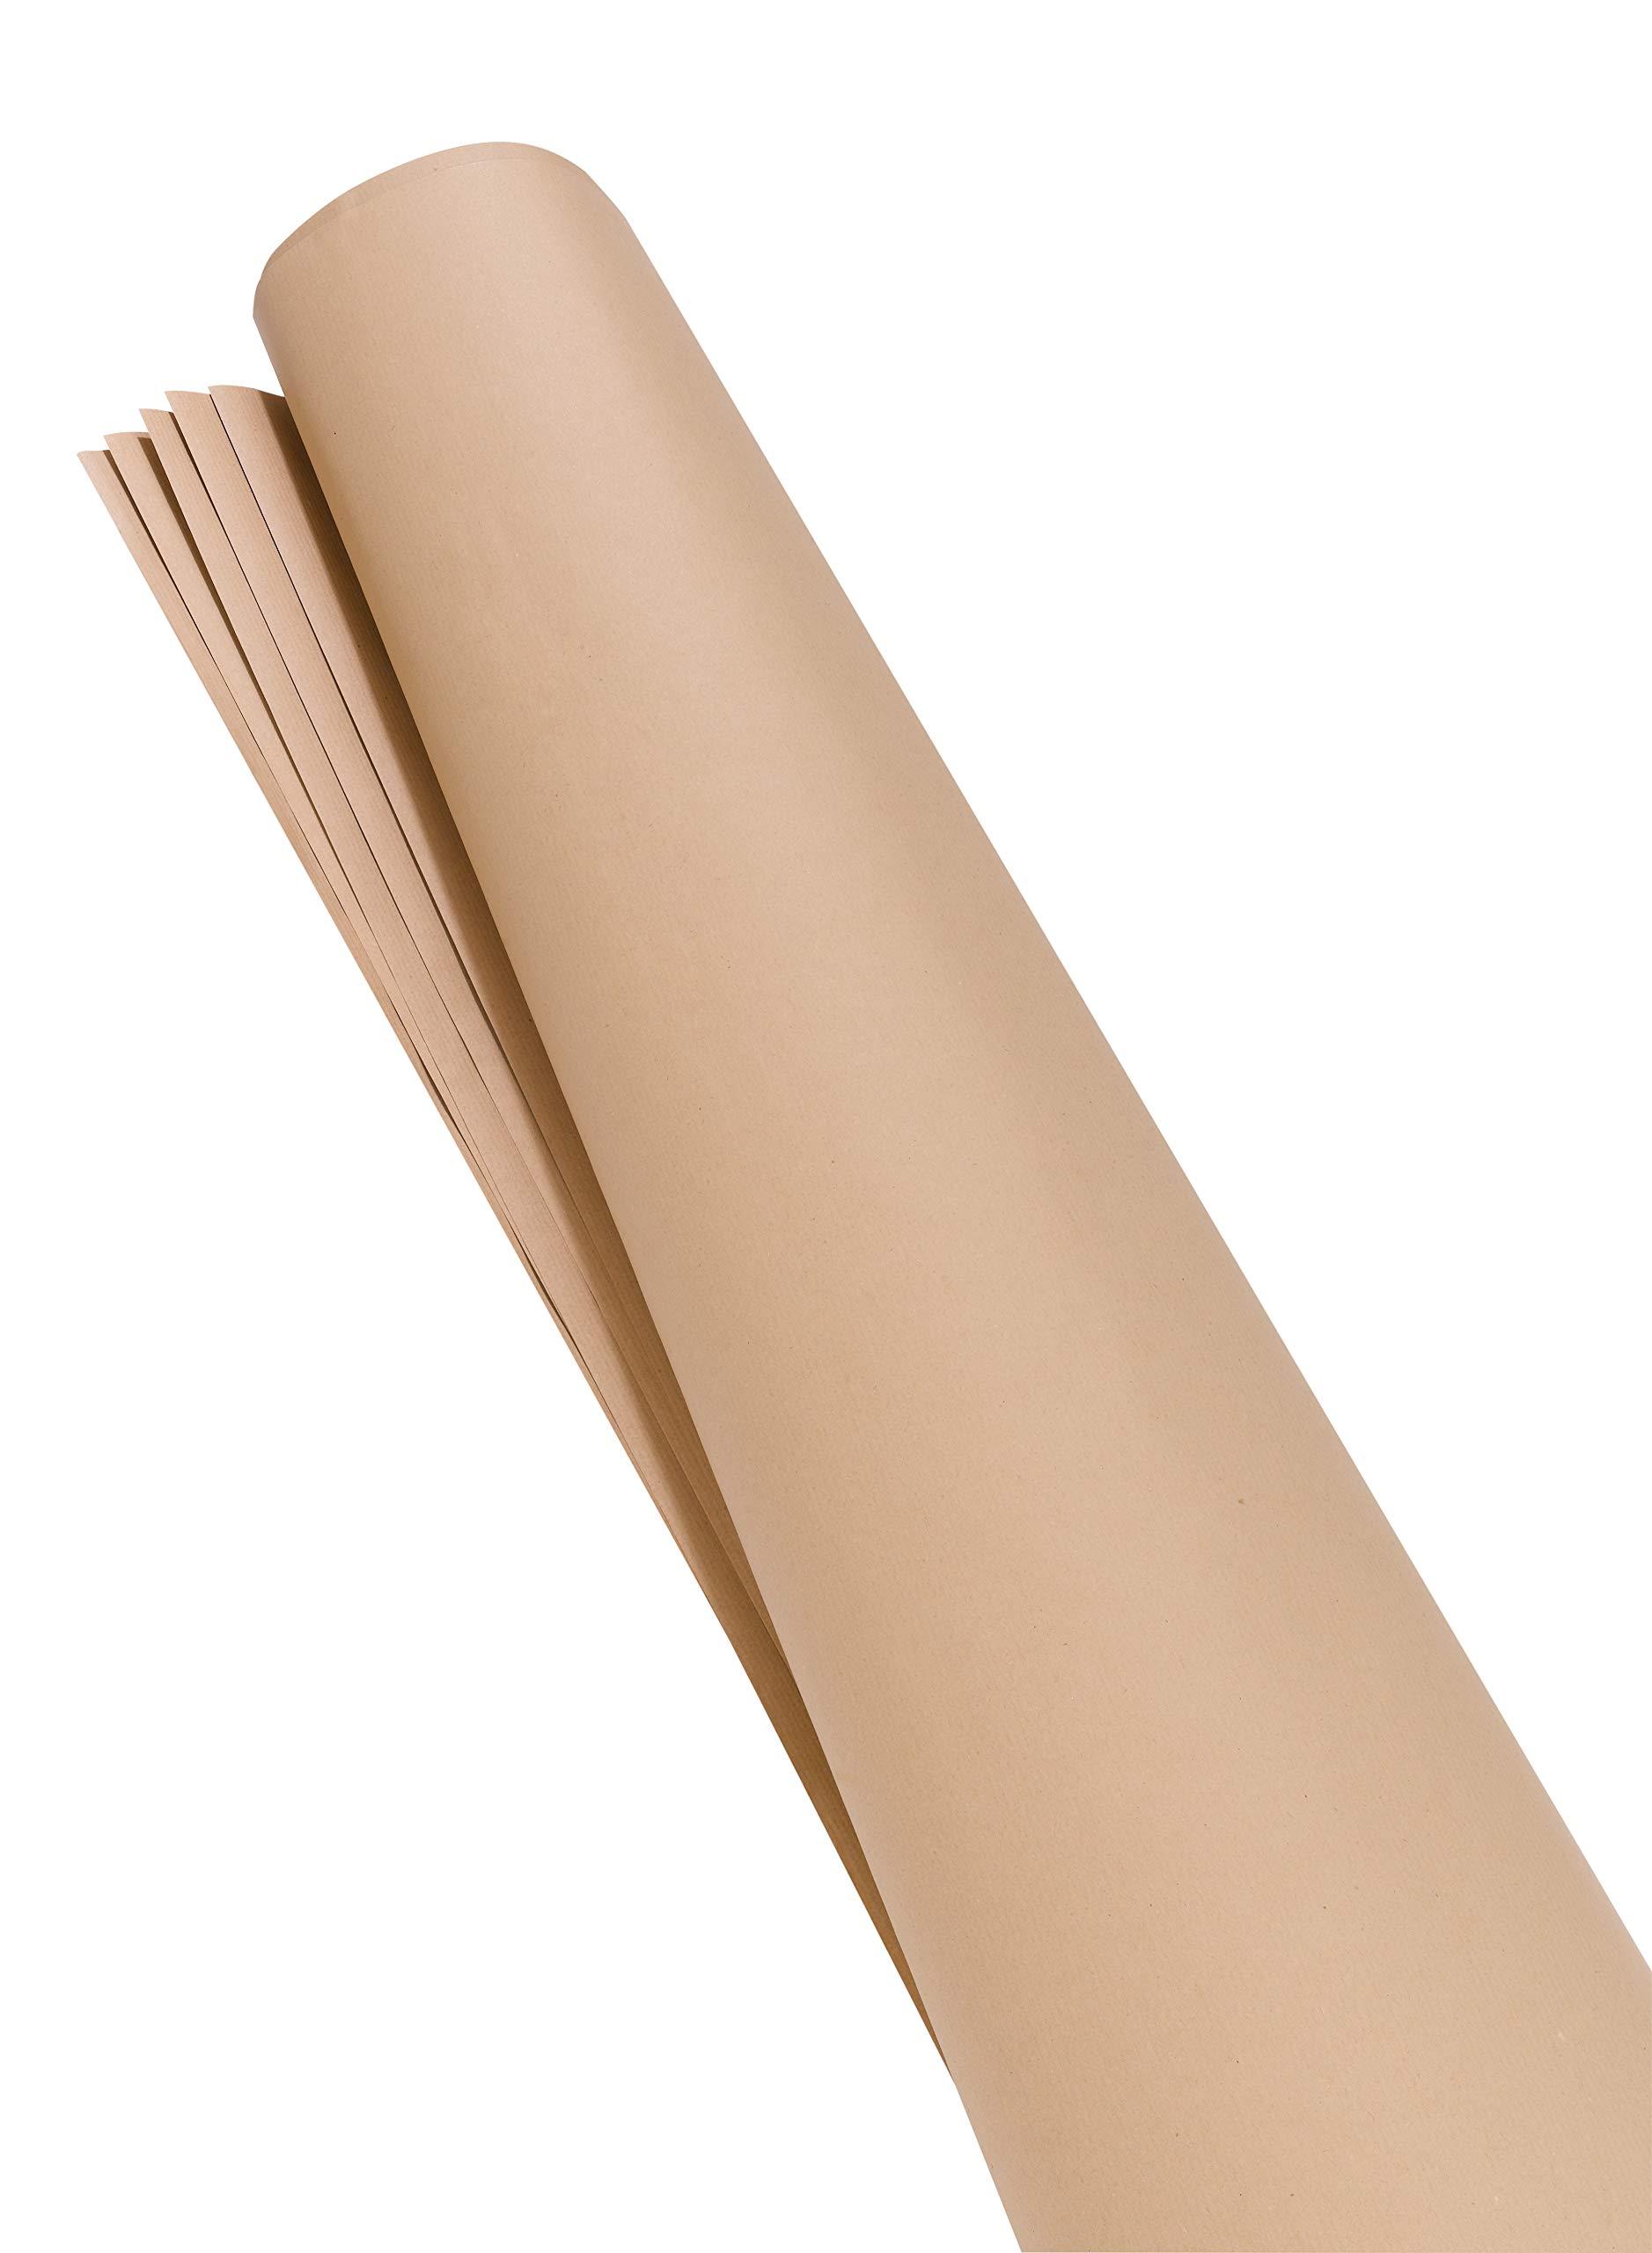 Franken-UMZ-MP-Moderationspapier-140-x-110-cm-Kraftpapier-80-gqm-100-Stck-beige